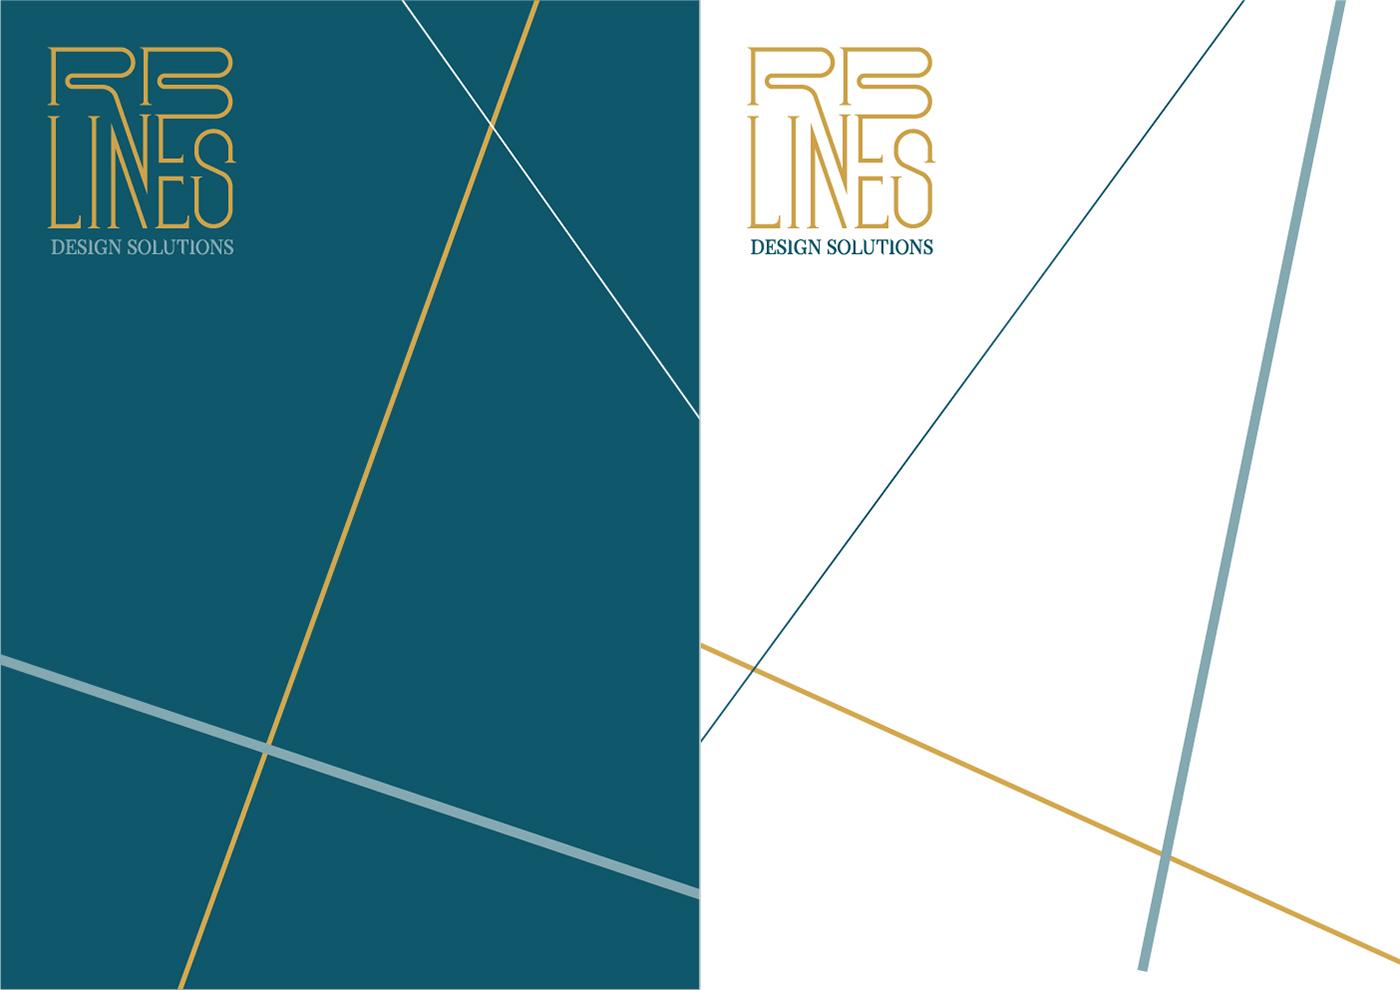 Line Design Solutions : Rb lines design solutions on behance